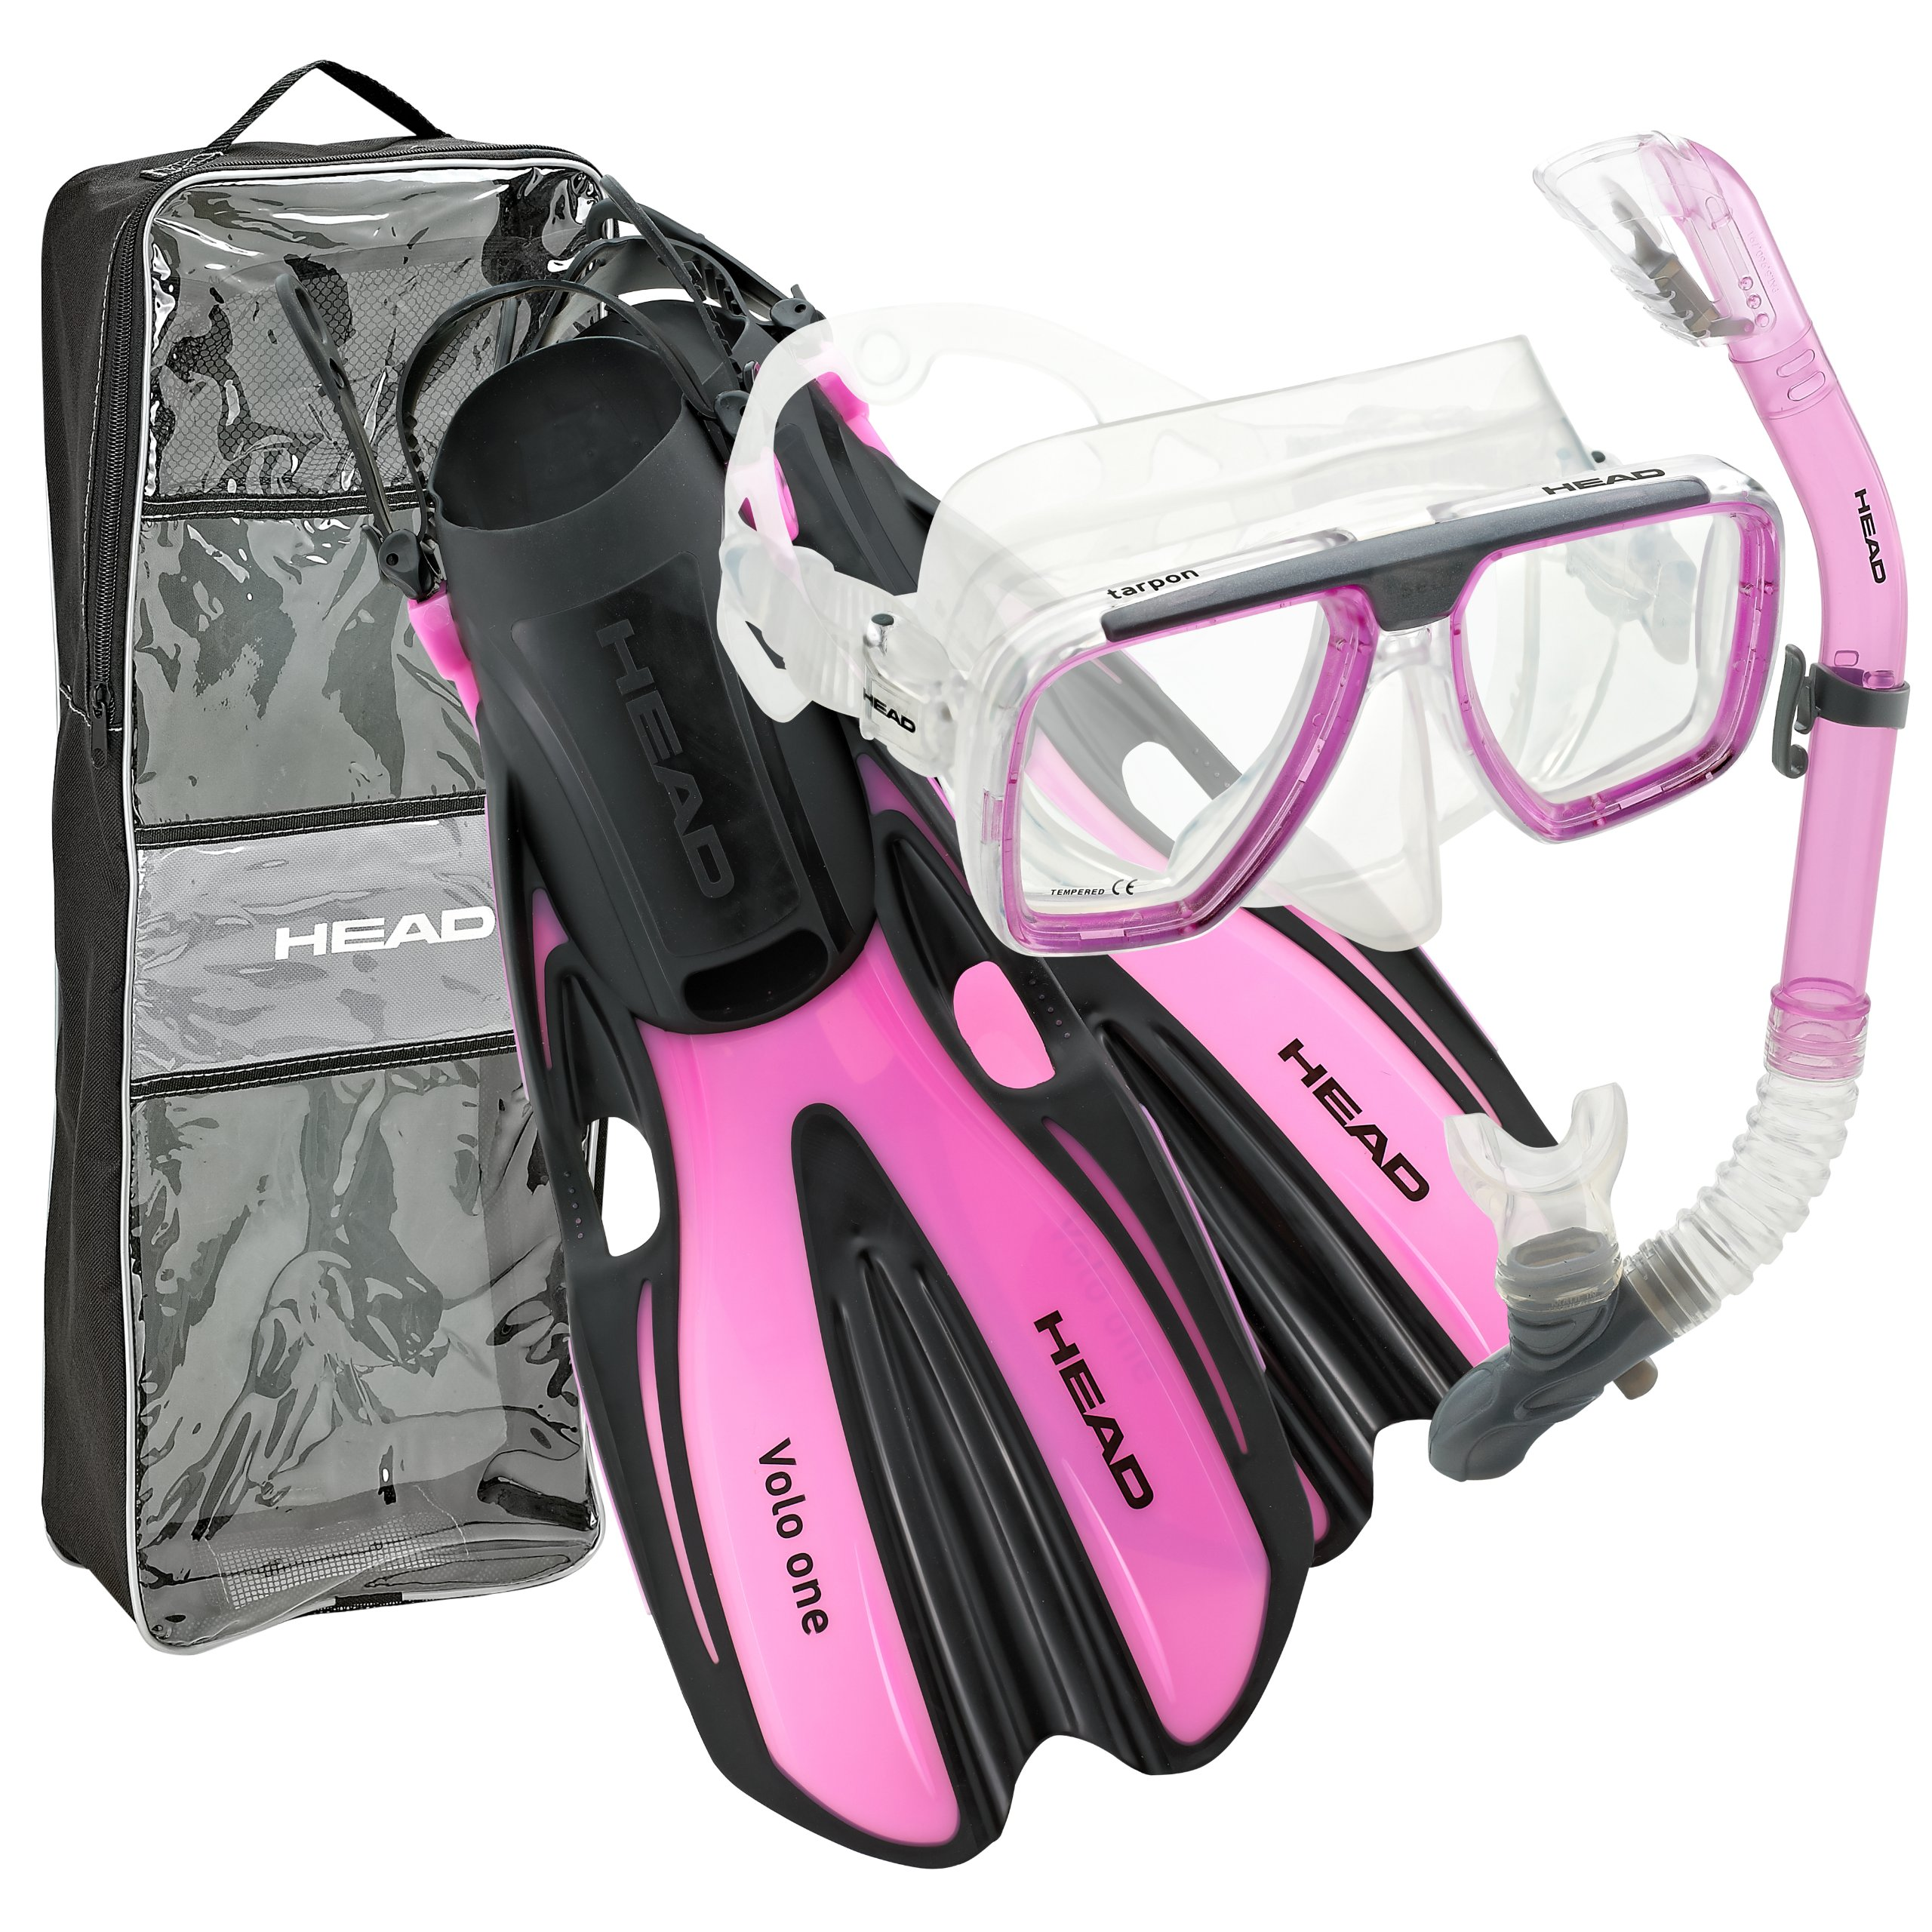 HEAD by Mares Tarpon Travel Friendly Premium Mask Fin Snorkel Set, Pink, Small, (4-6)